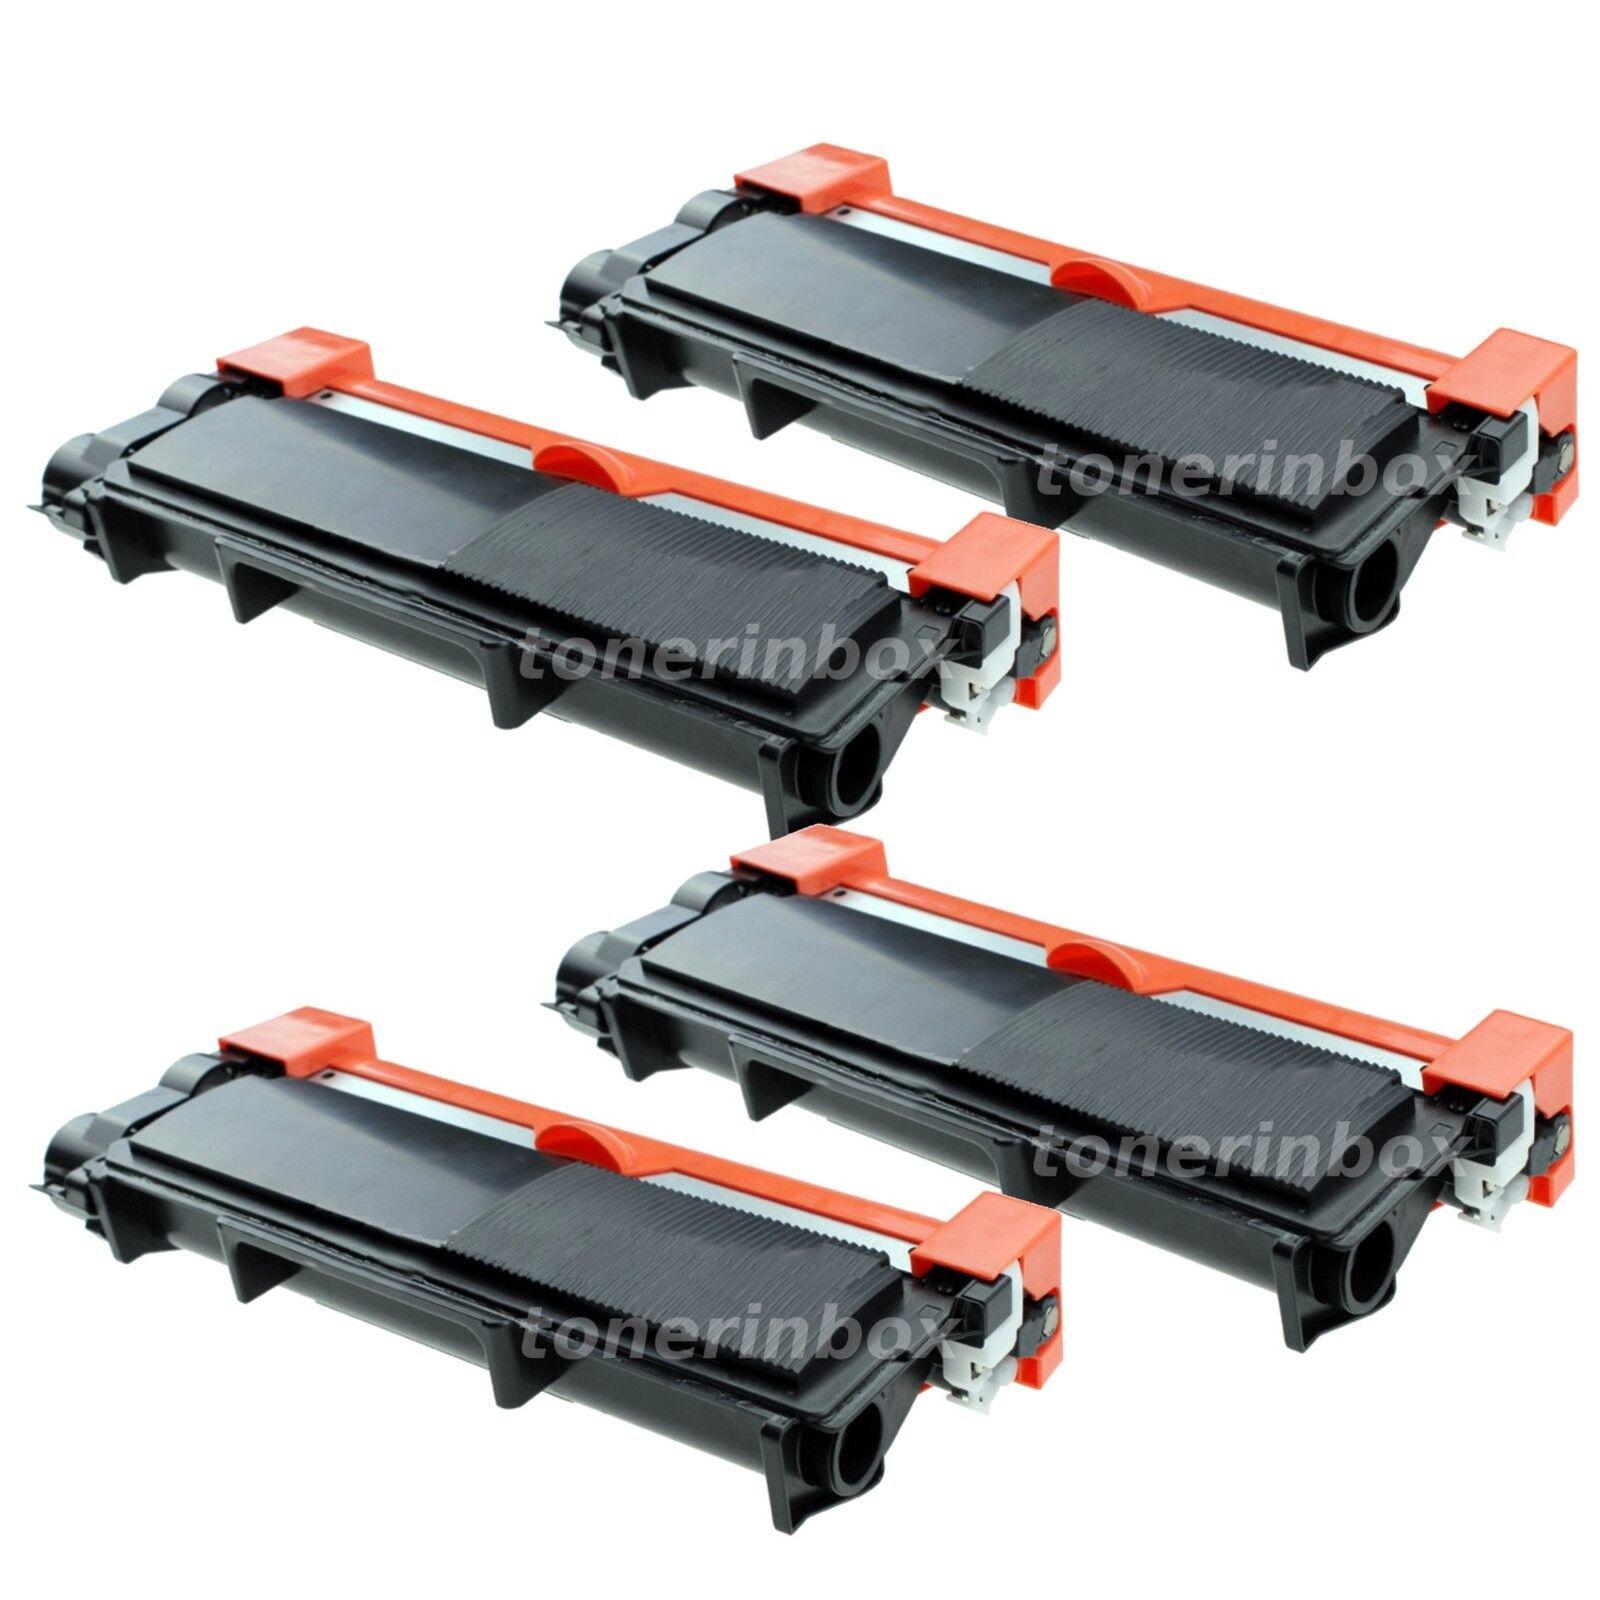 4x TN-660 TN660 HY Toner Cartridge For Brother HL-L2340DW HL